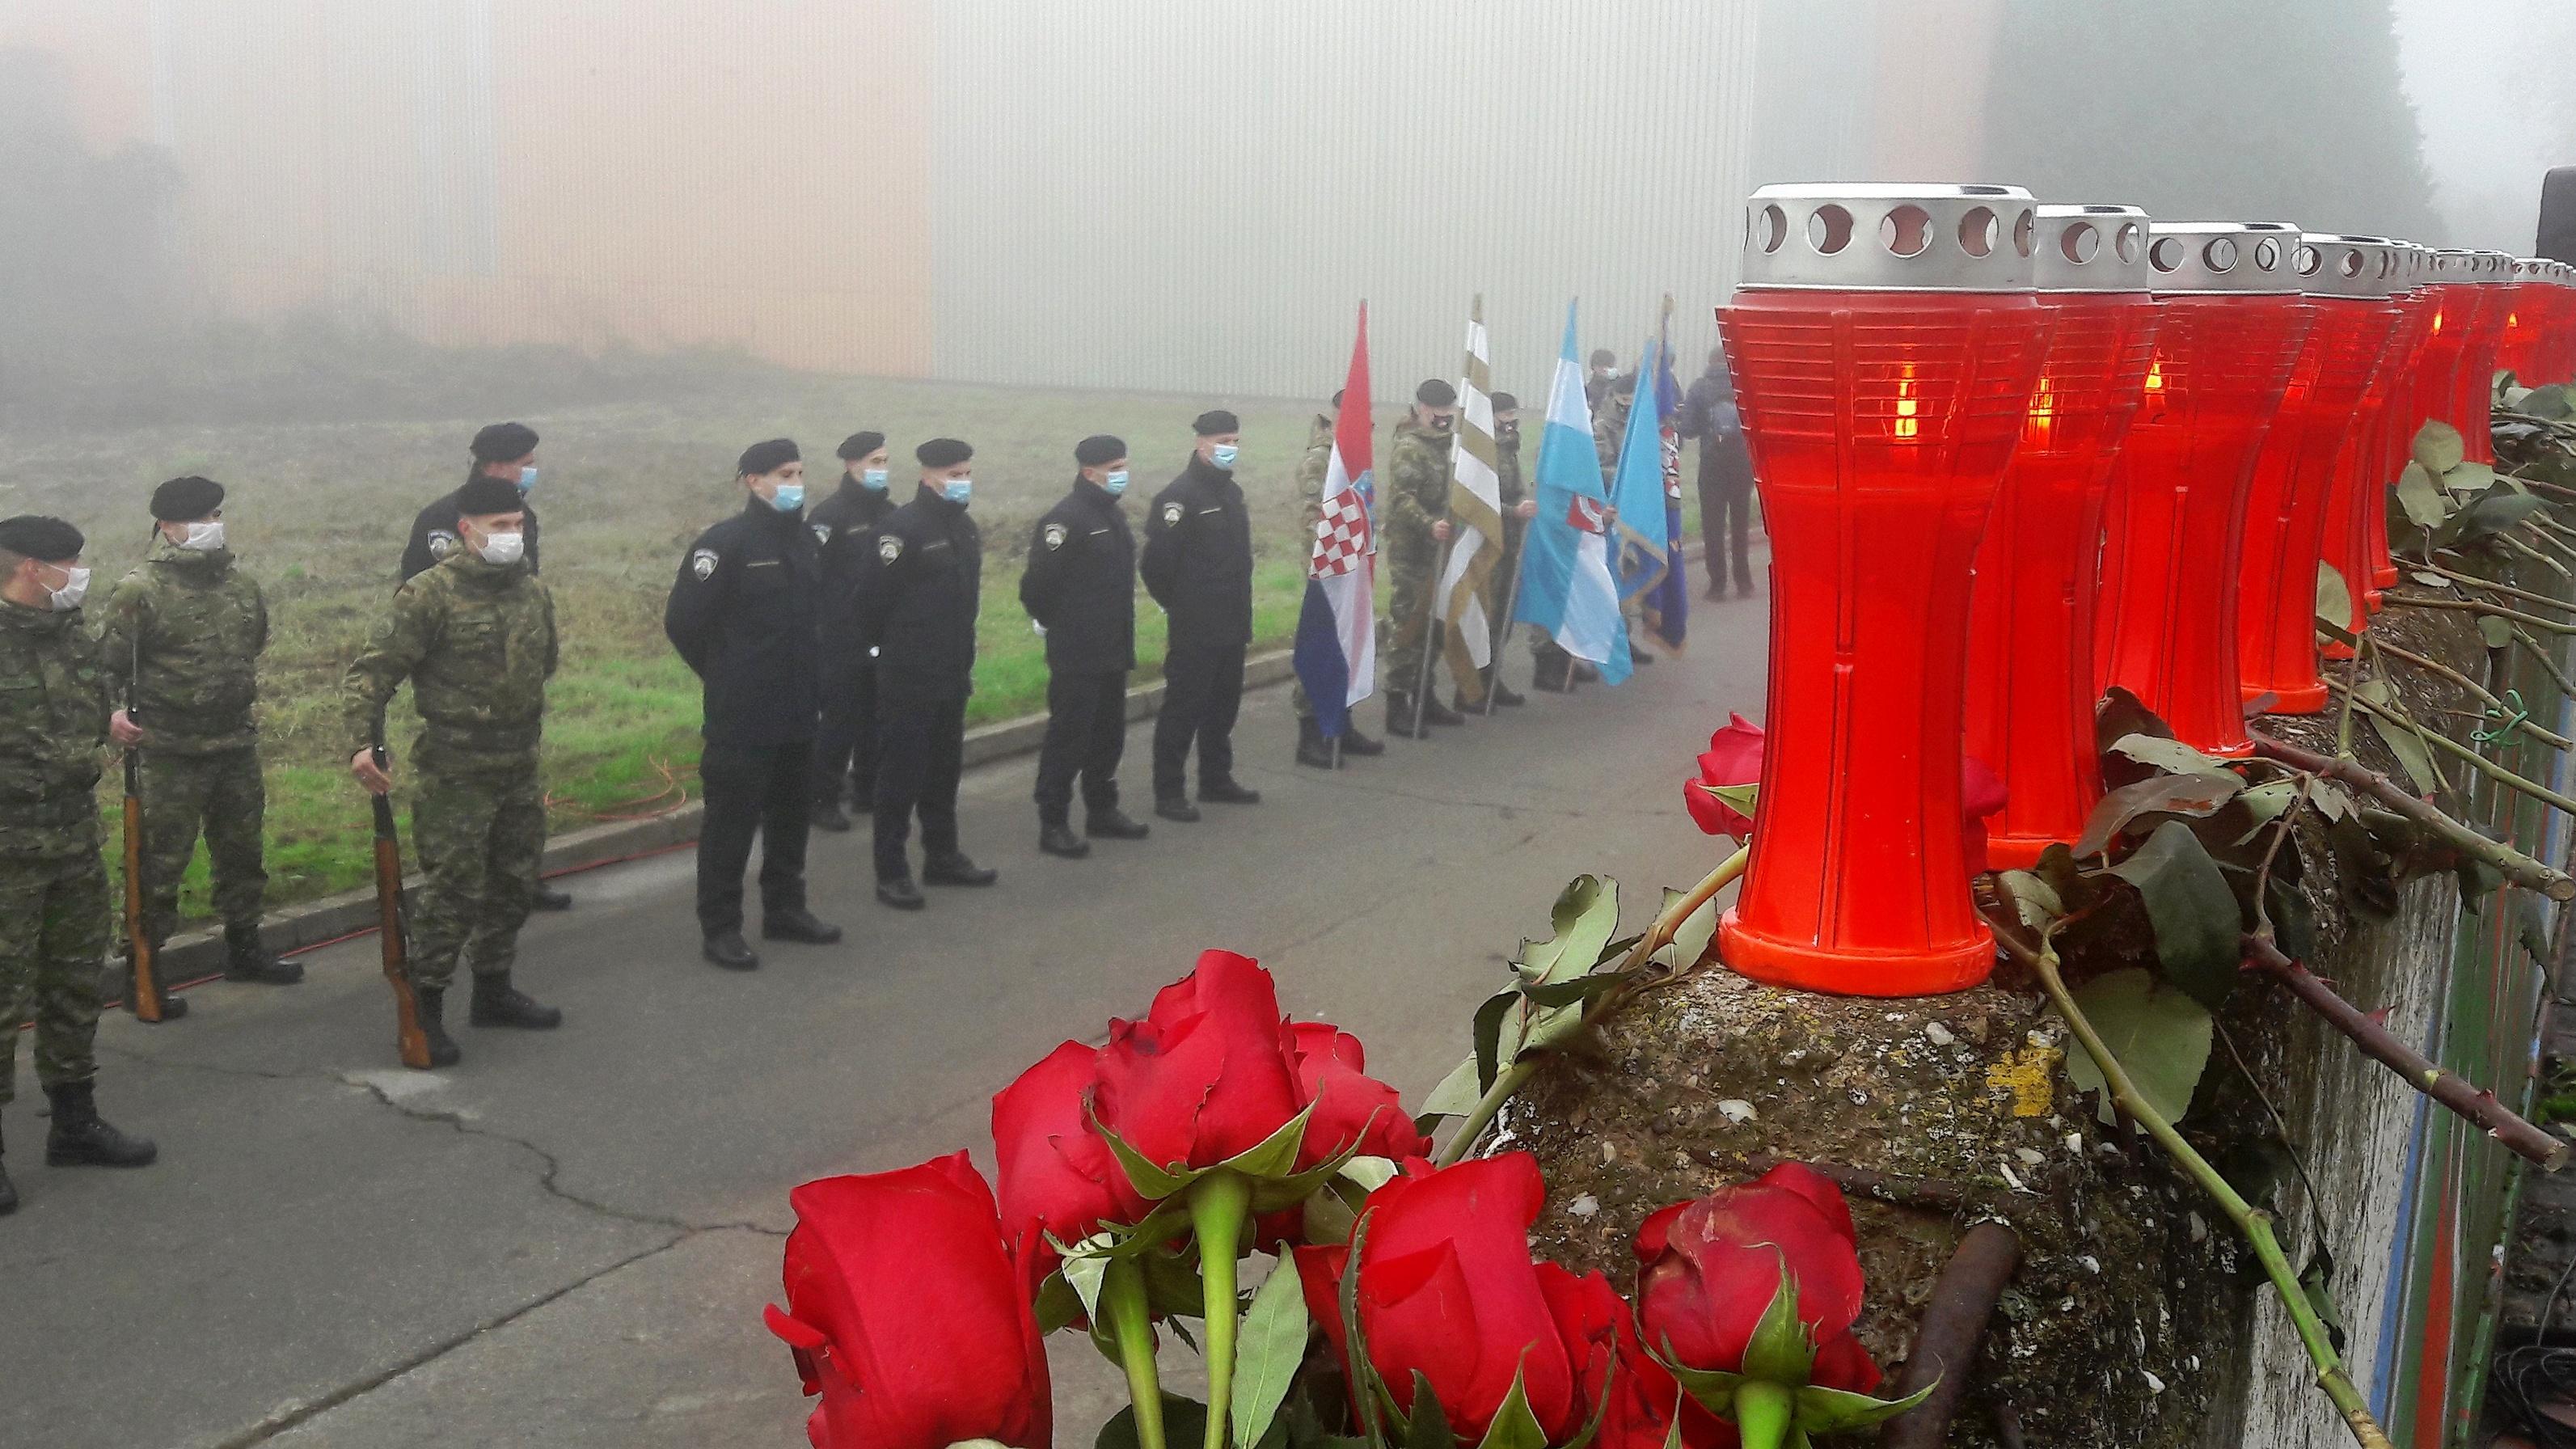 Obilježena 29. obljetnica stradanja vukovarske gradske četvrti Borova naselja